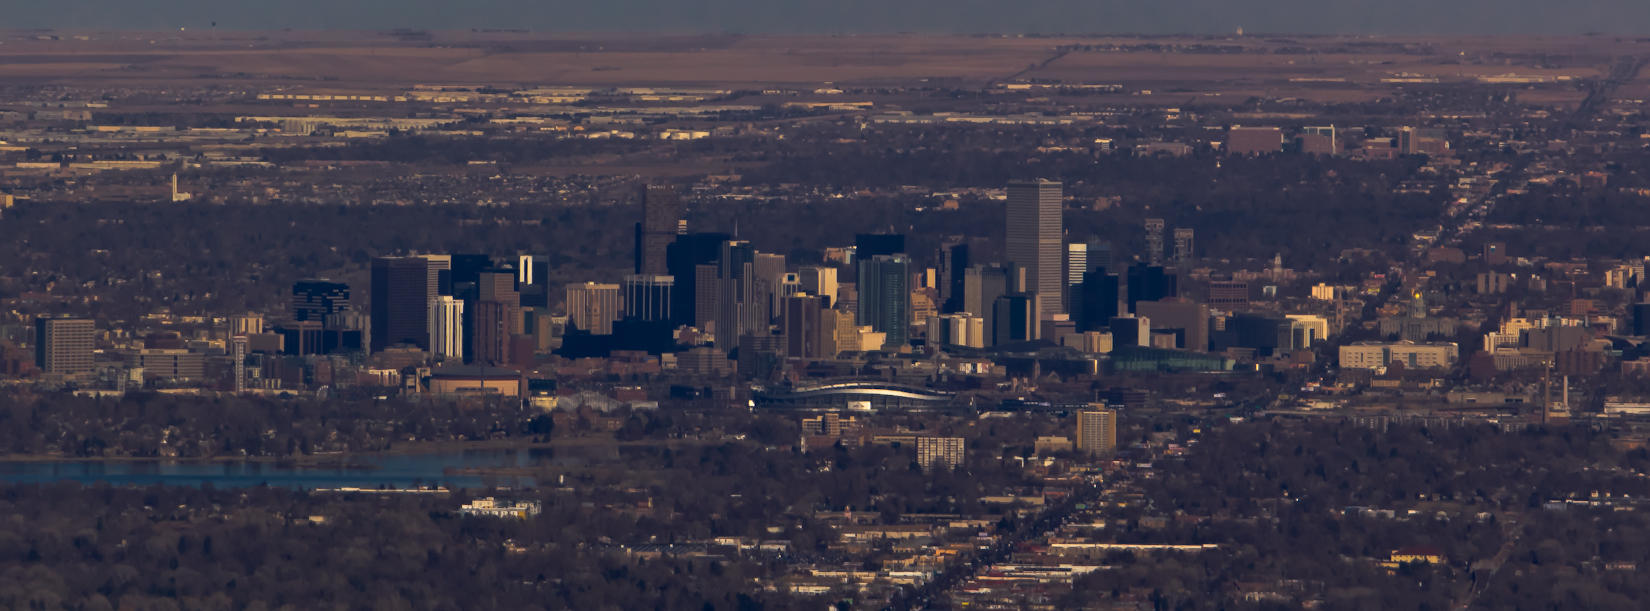 File:Denver cityscape from Lookout Mountain, 2011.jpg - Wikimedia ...